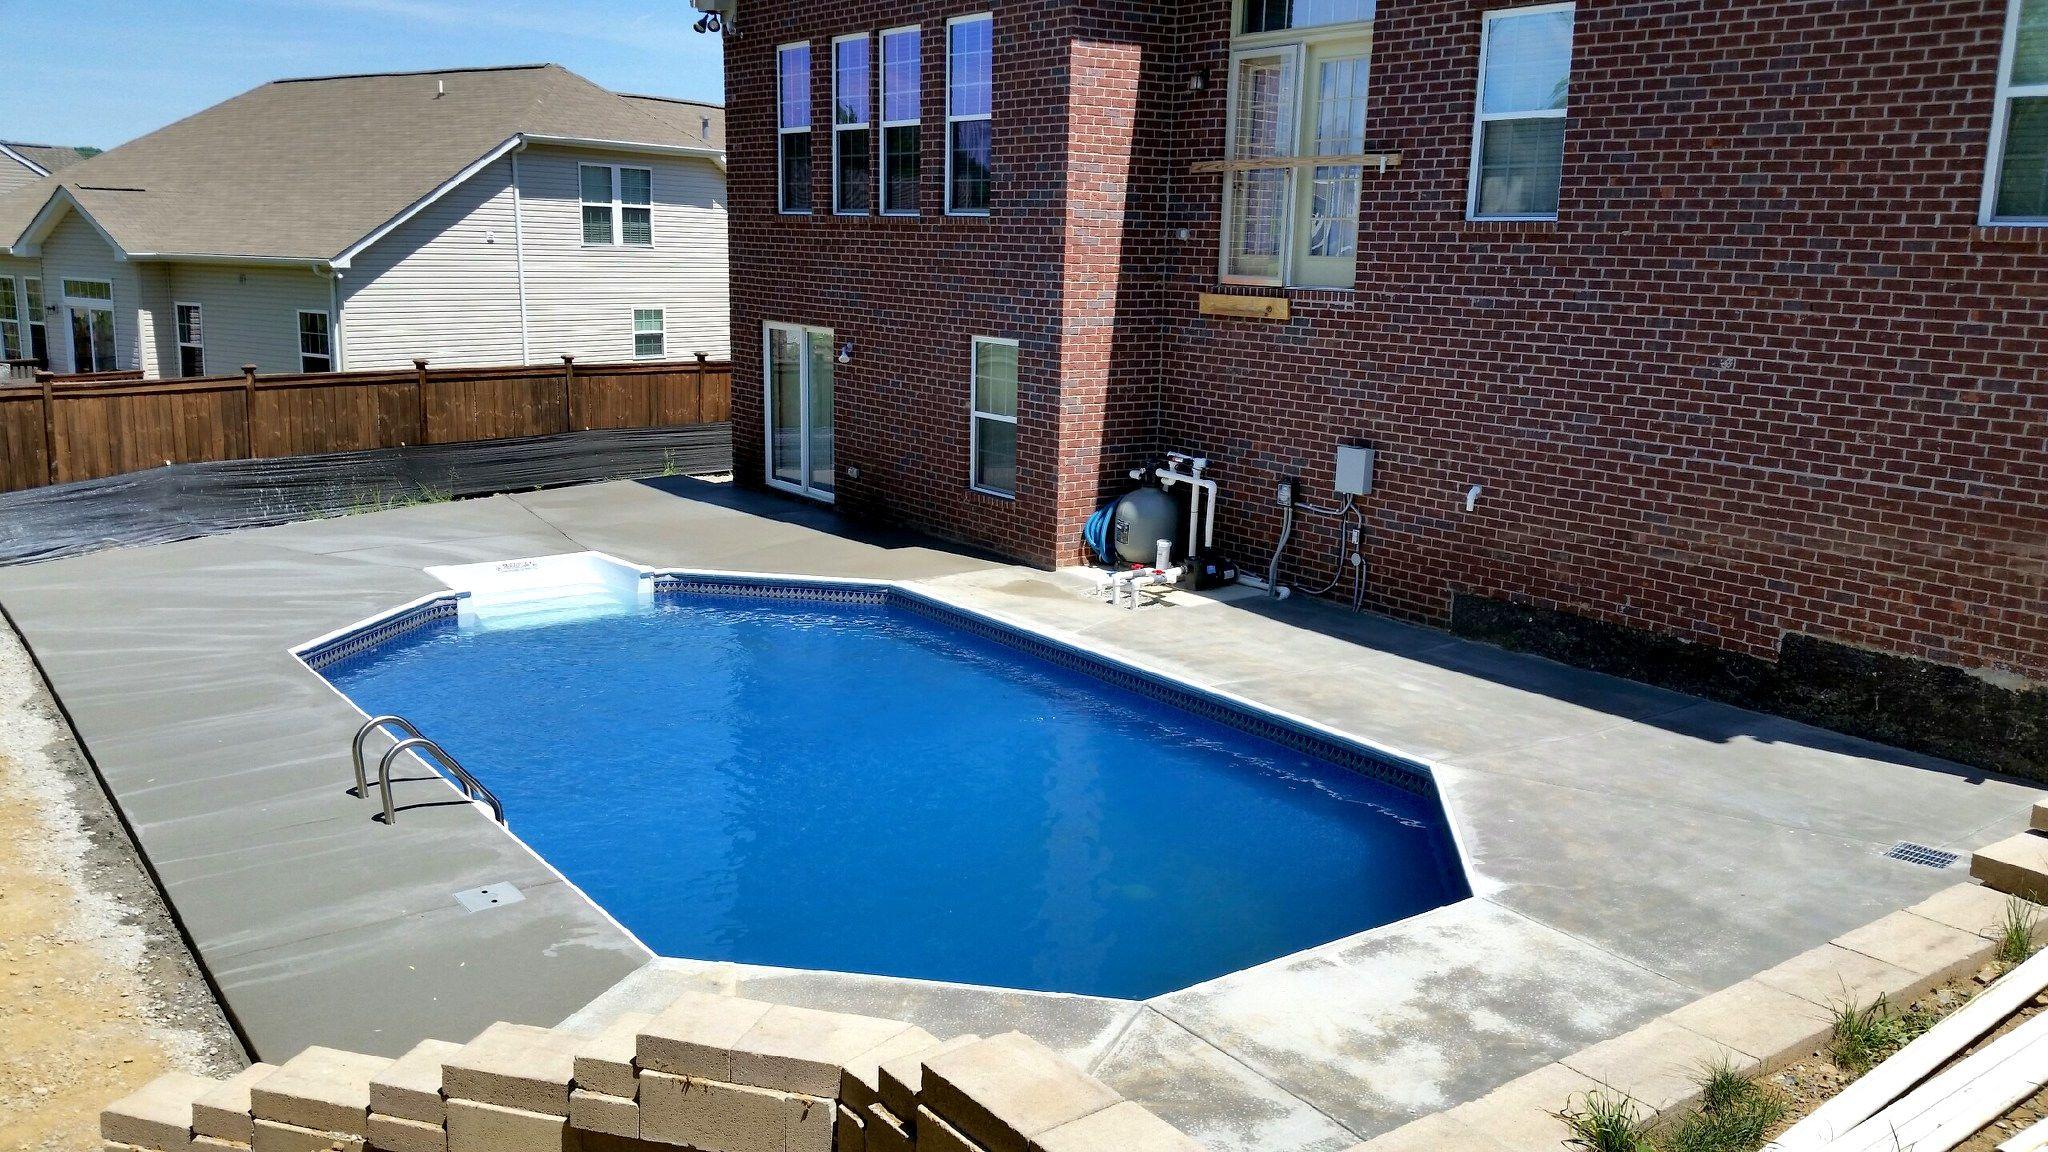 Steel Wall Pools Nashville, Pool Designer Brentwood